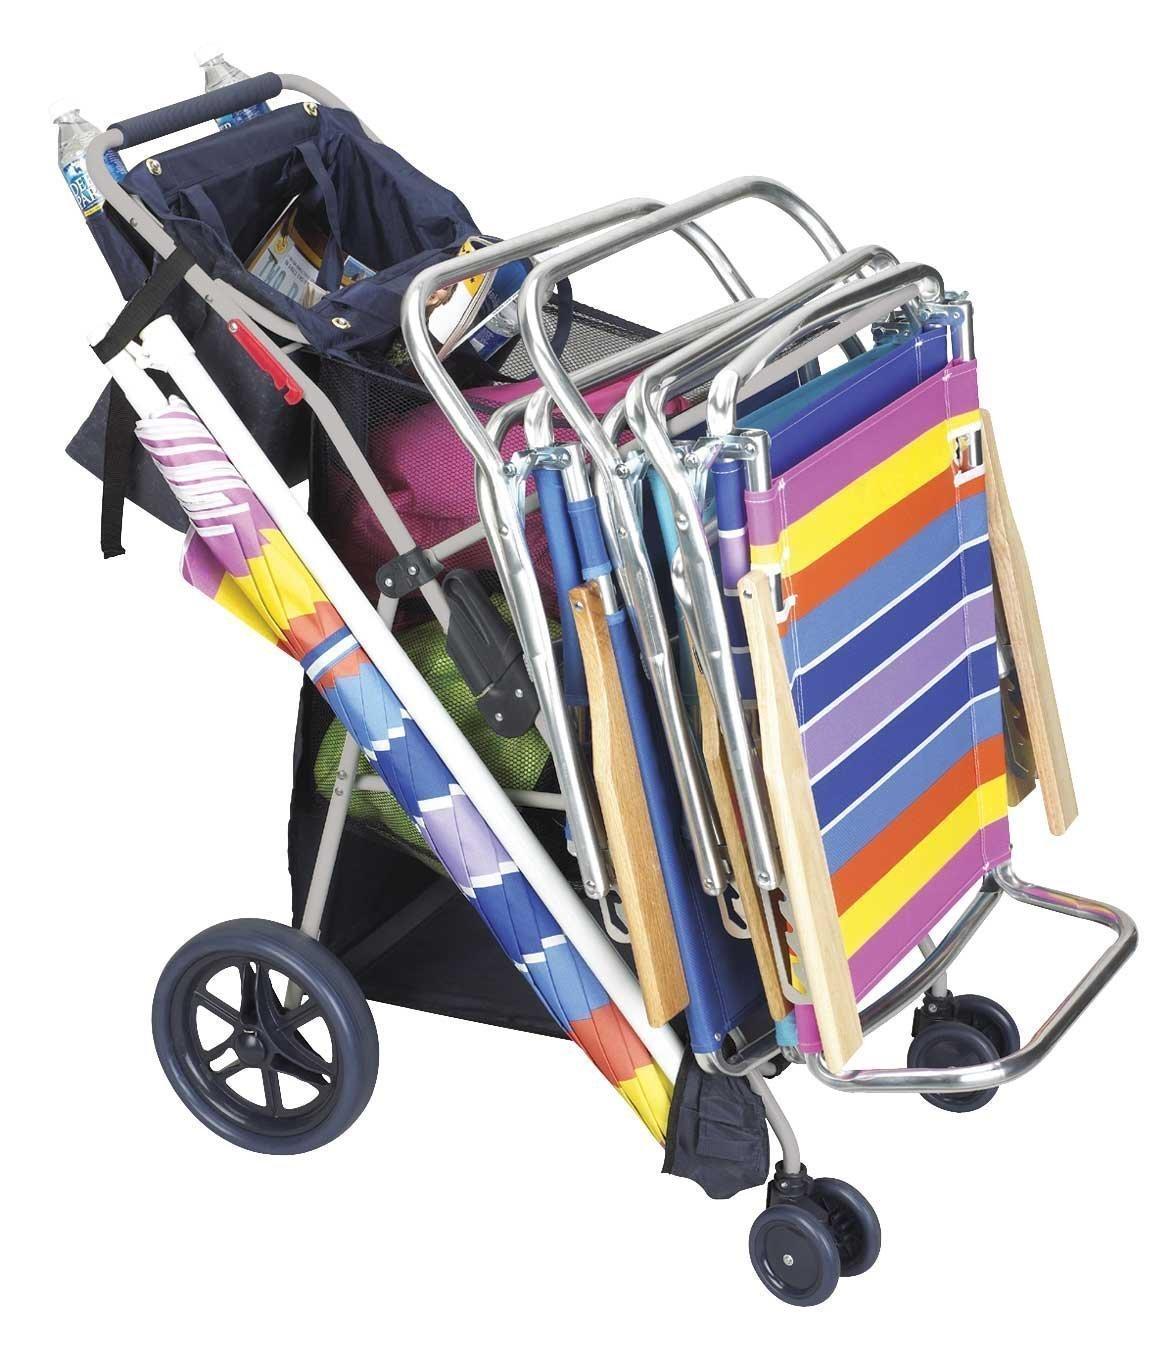 Deluxe Wonder Wheeler Beach Cart